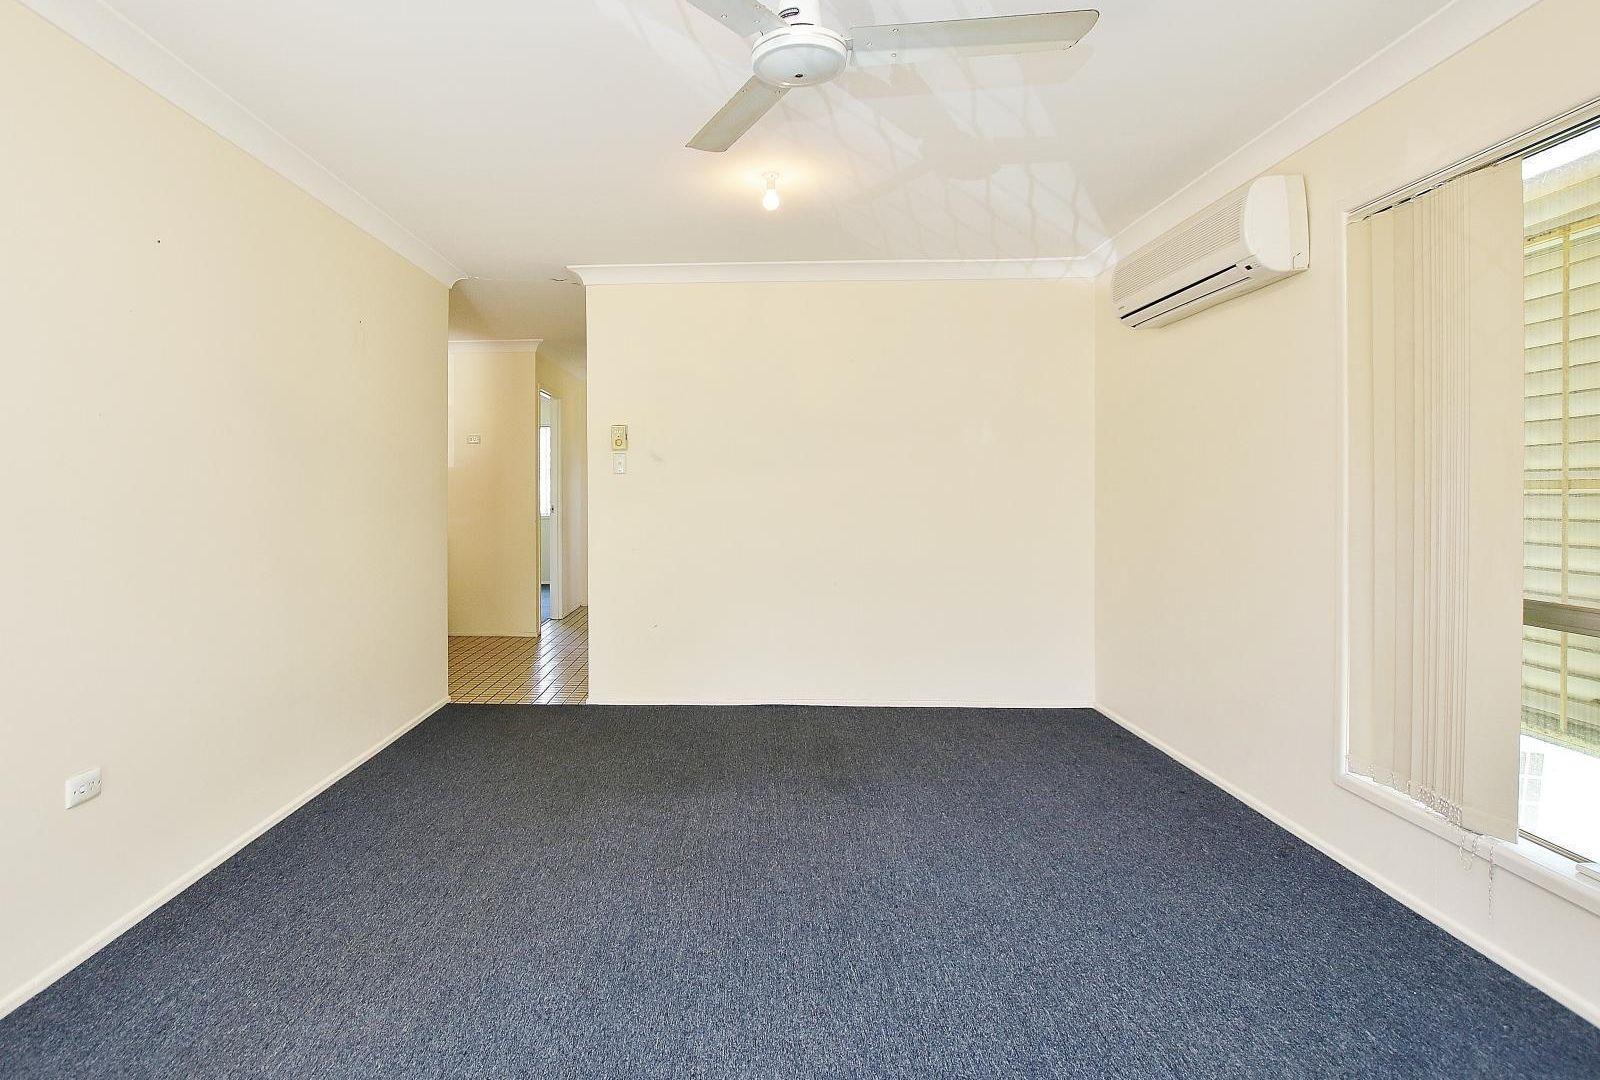 2/10 Kelman Street, Norman Gardens QLD 4701, Image 1